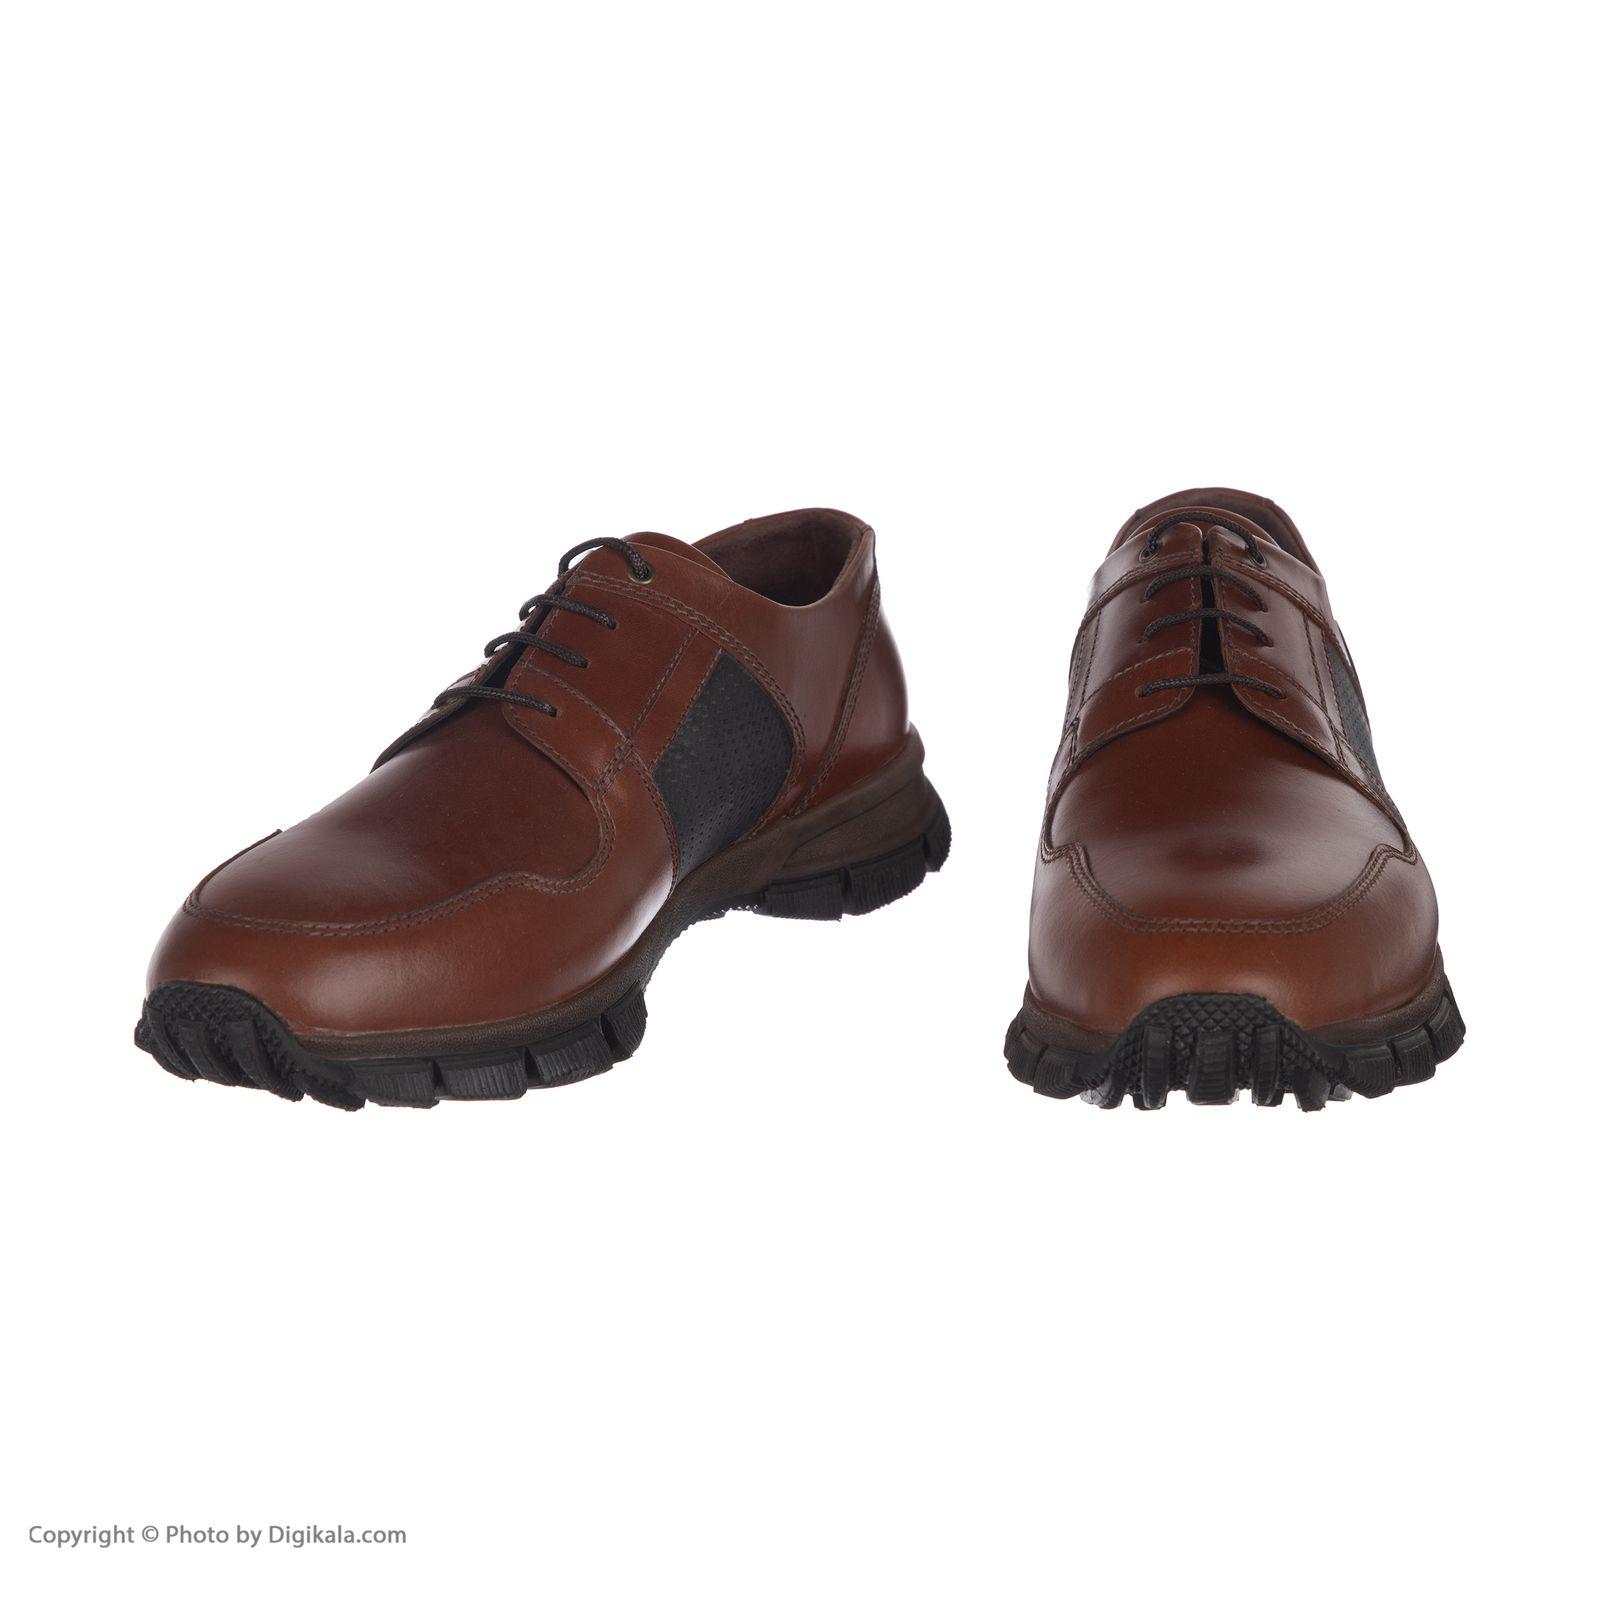 کفش روزمره مردانه دانادل مدل 8604B503136 -  - 4